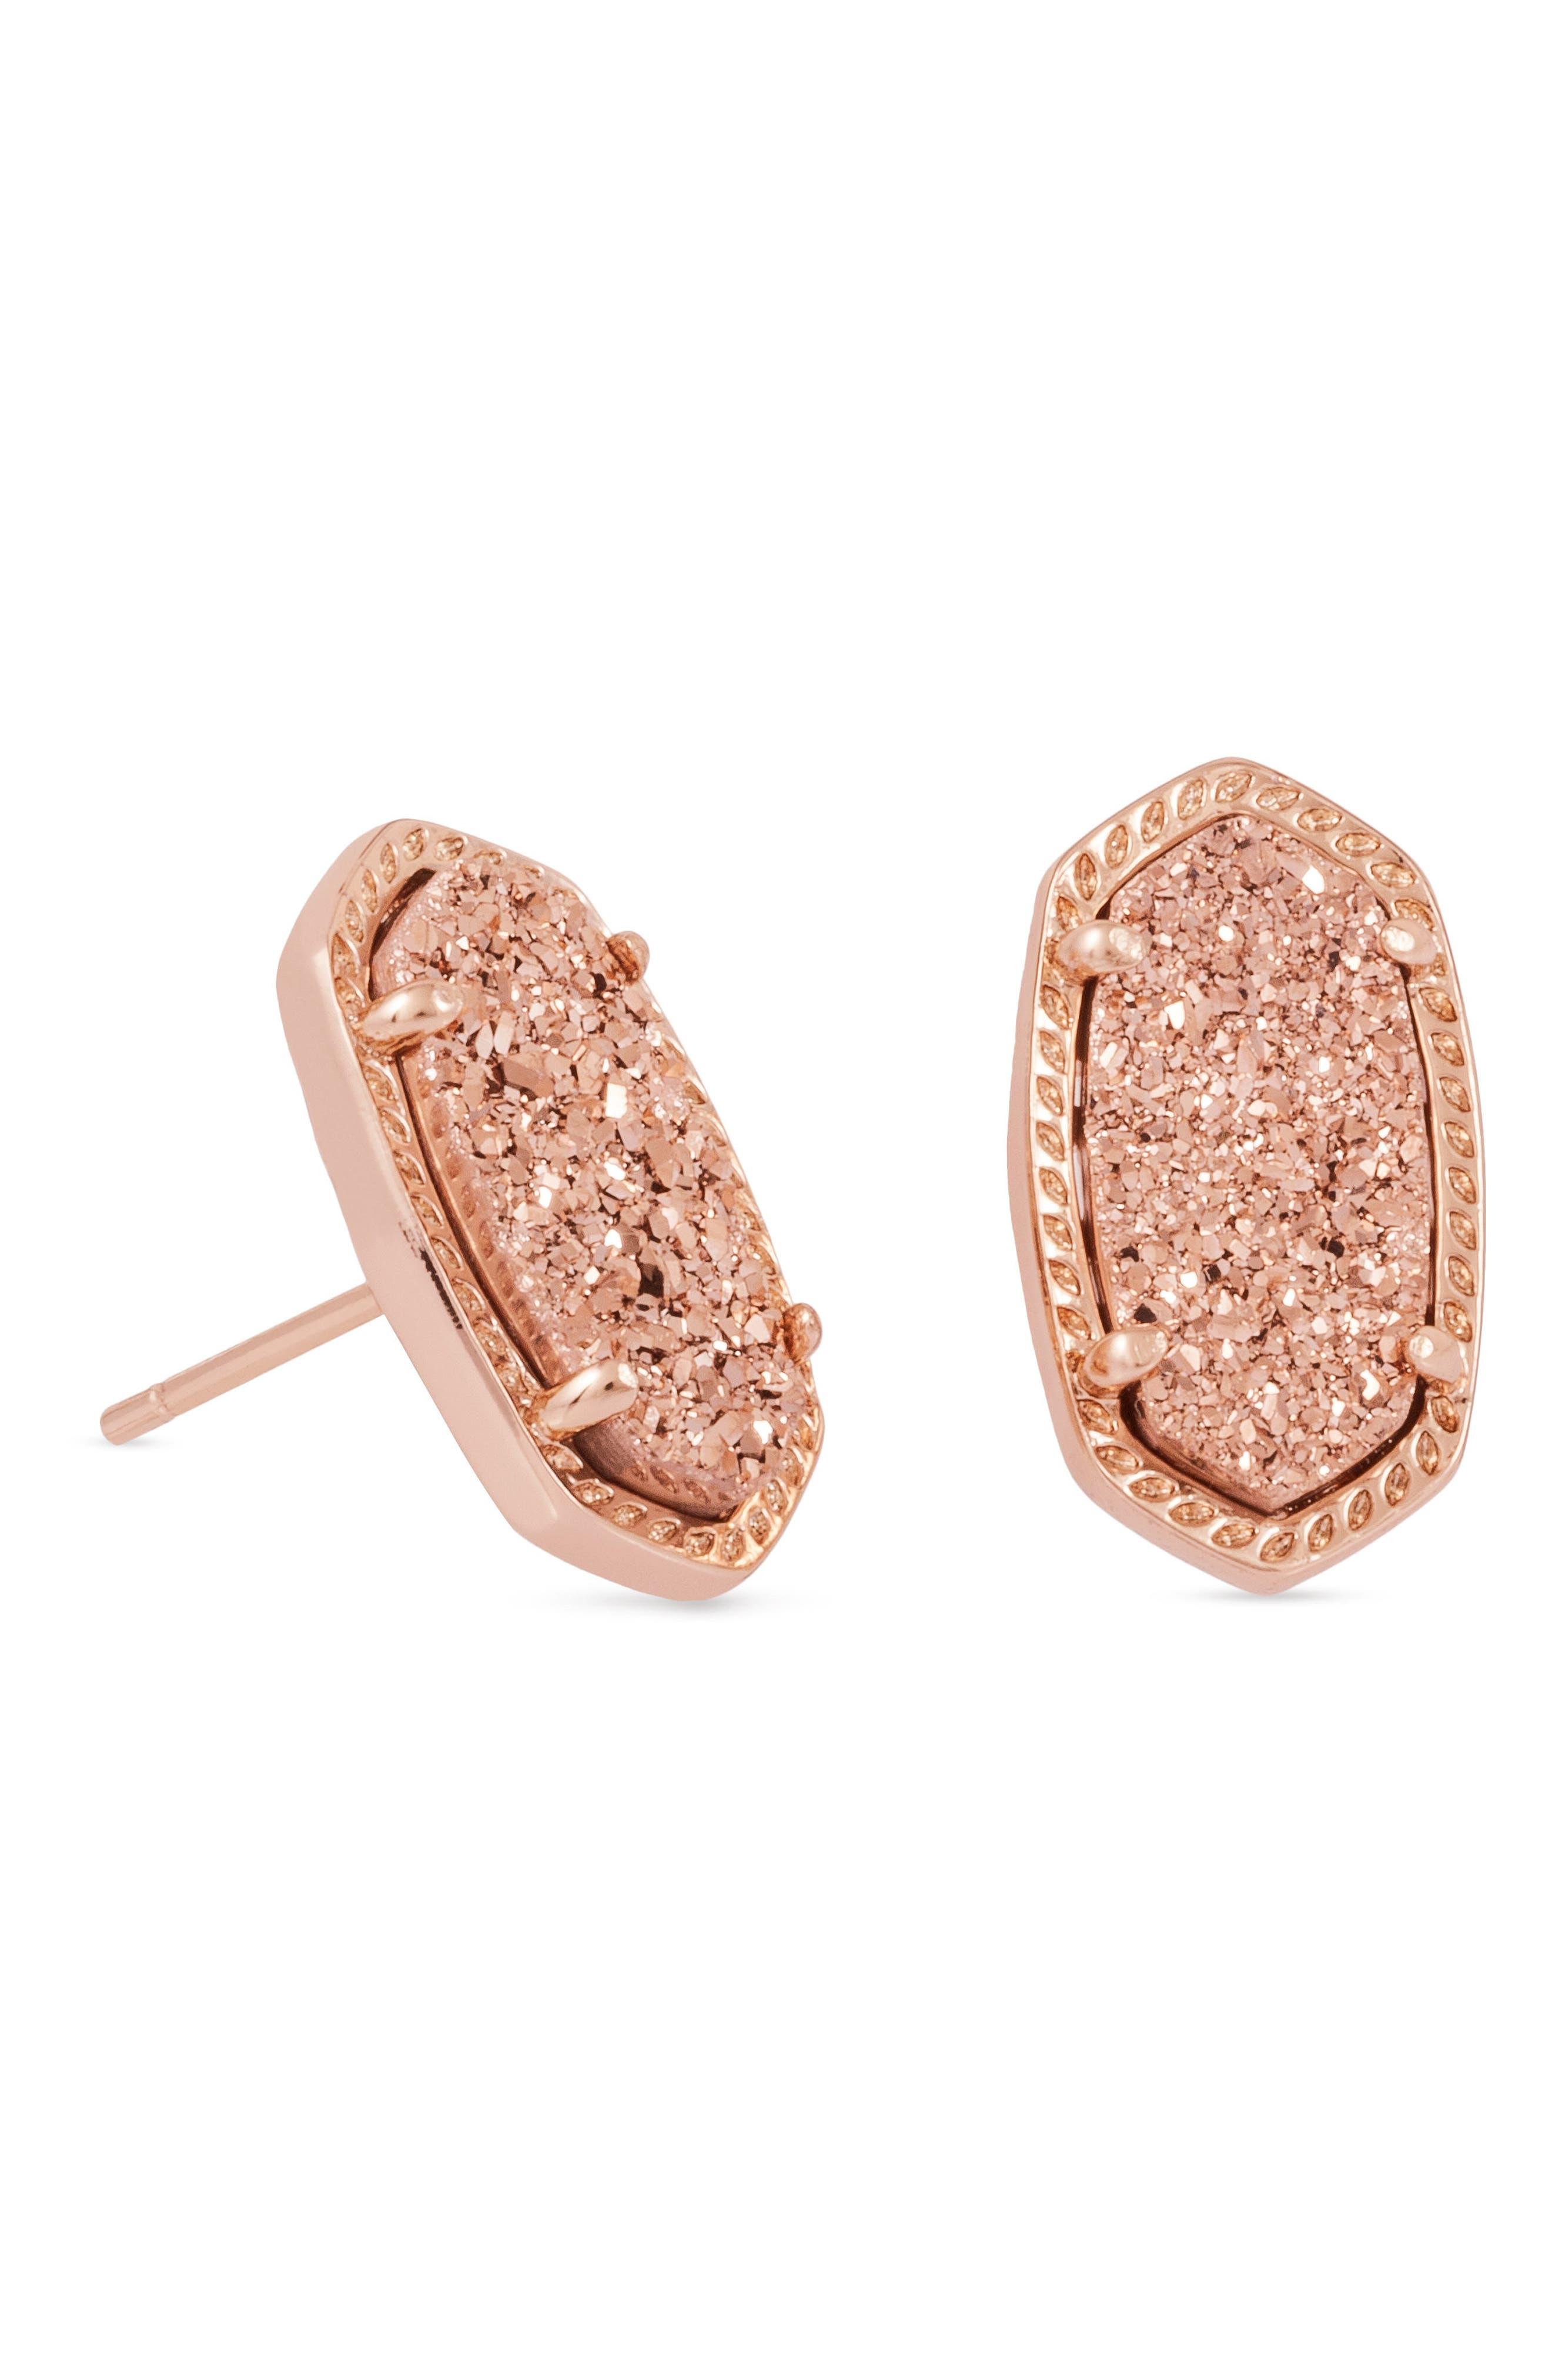 Ellie Oval Stone Stud Earrings,                             Alternate thumbnail 2, color,                             Rose Gold Drusy/ Rose Gold